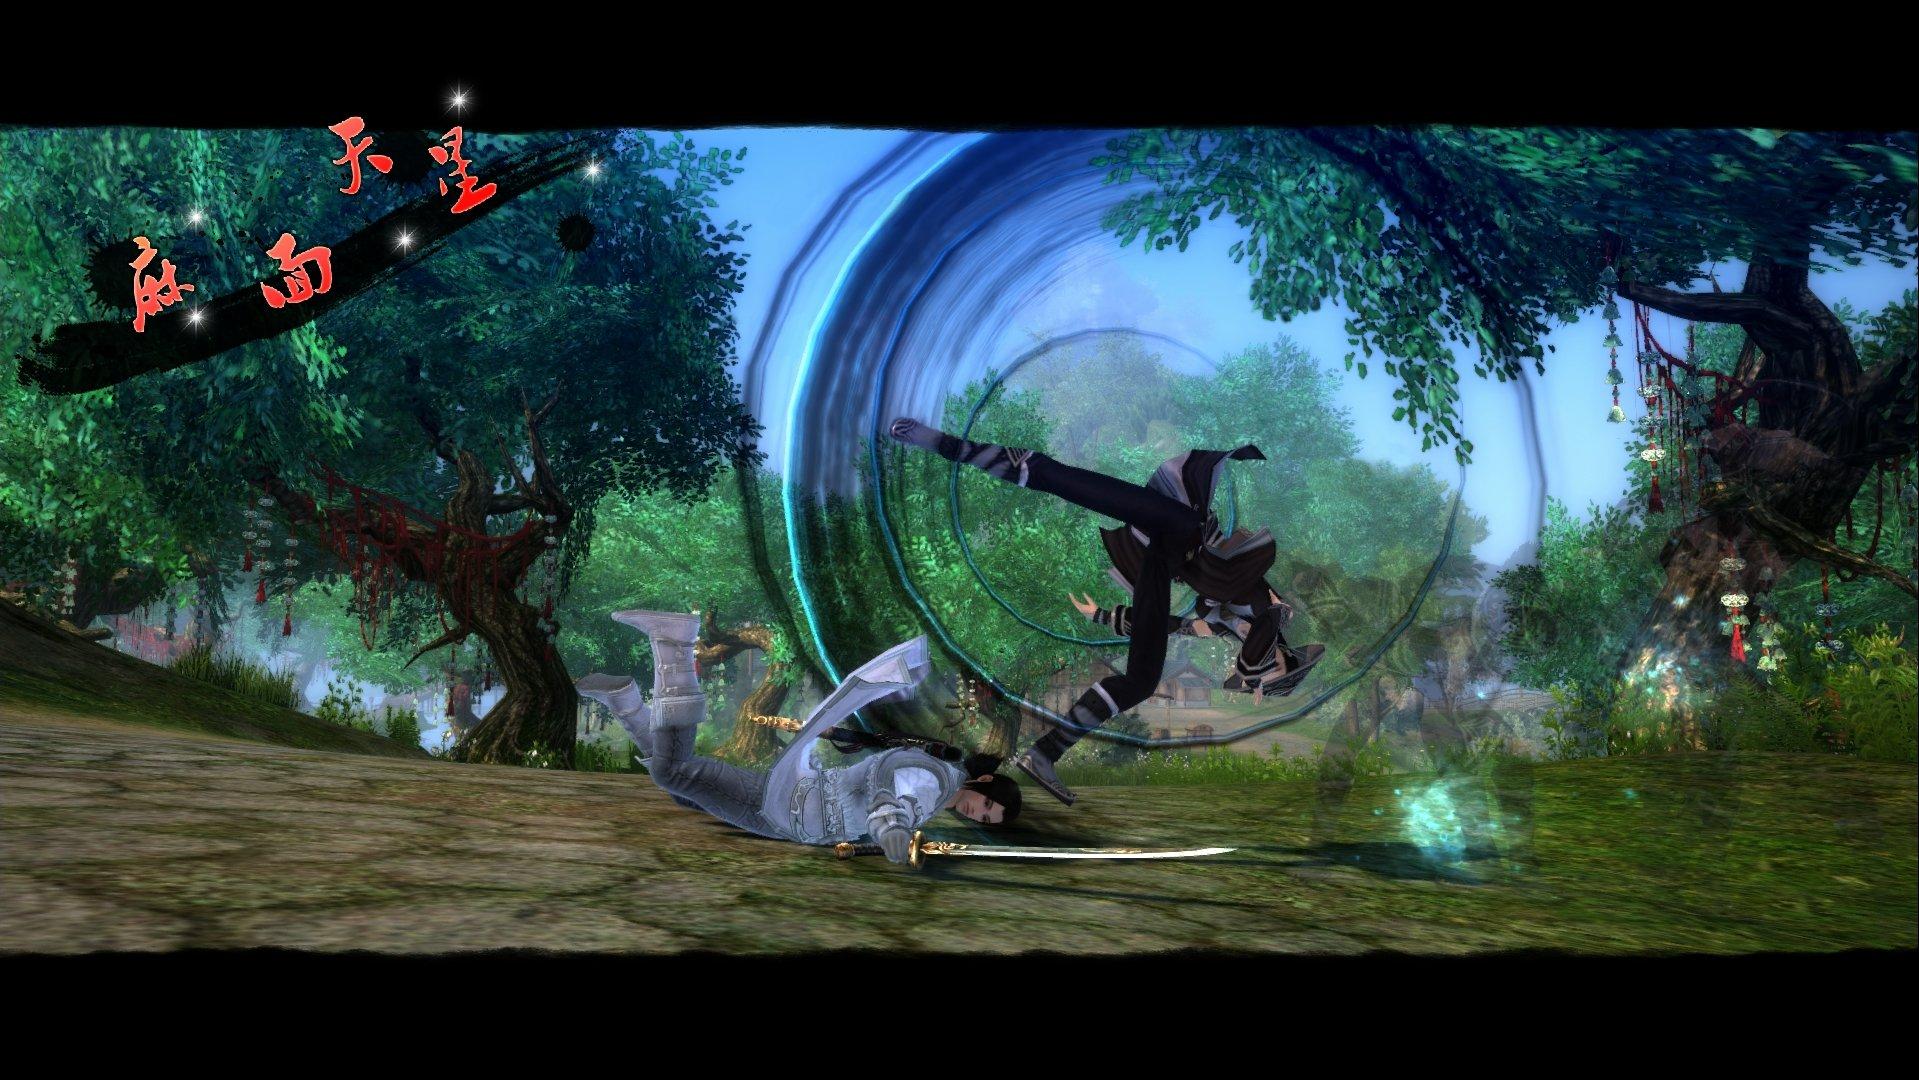 Легенды Кунг Фу - Бродяги - Изображение 1